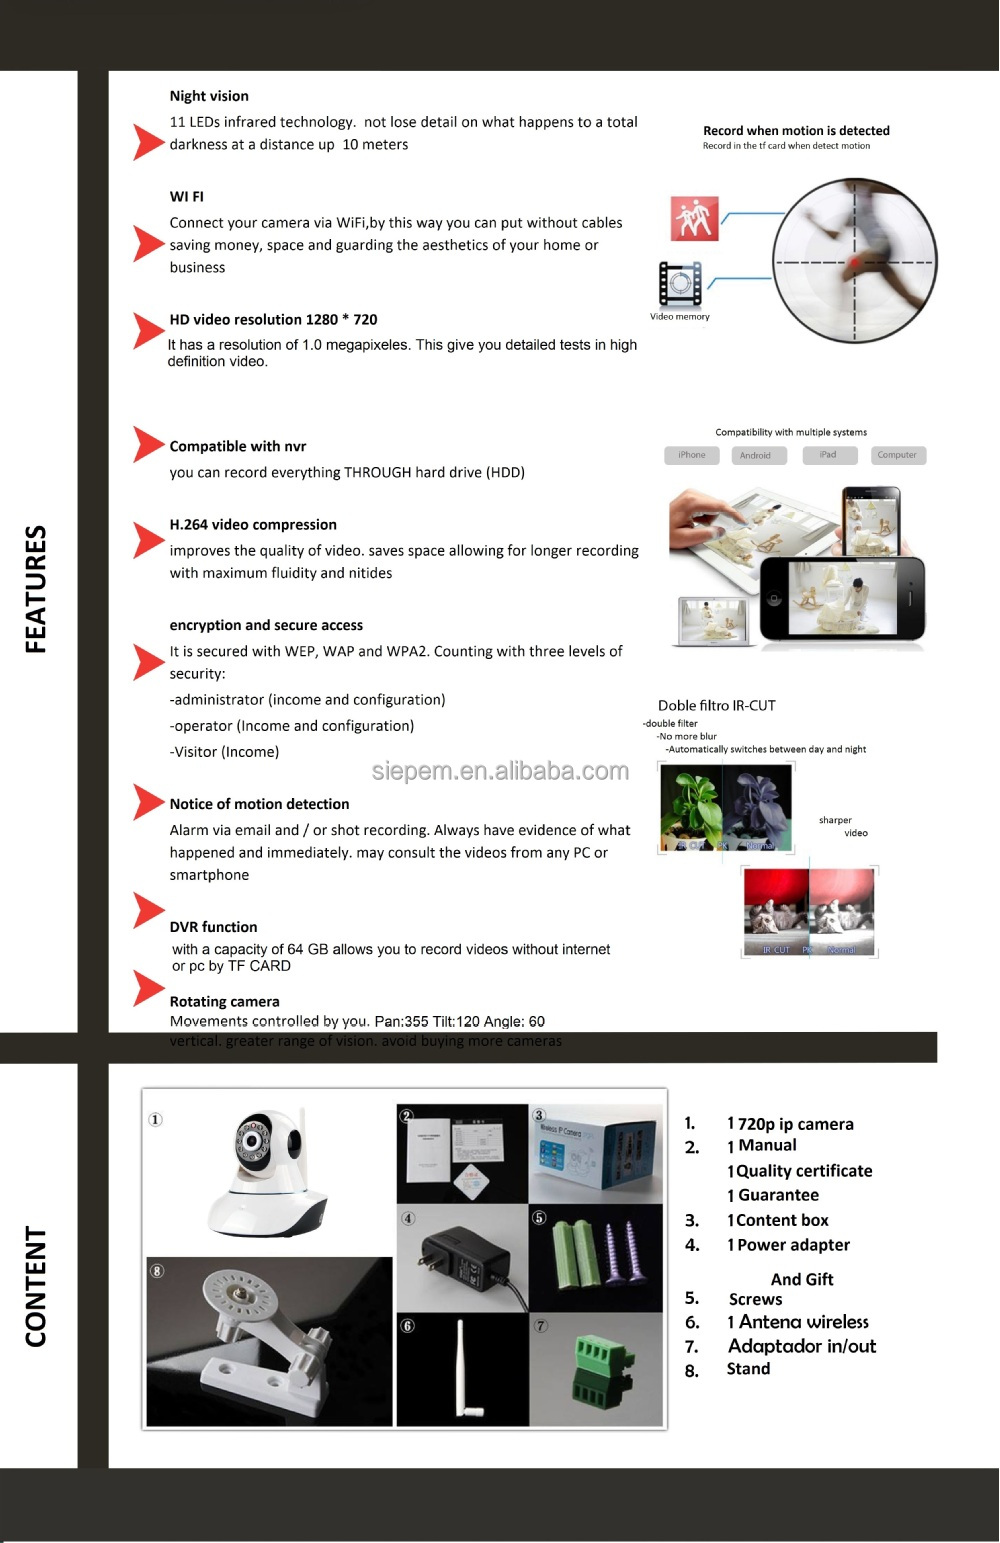 Low Price Best Sell Tv Hd 720p Ip Camera/vandal H 264 Hd 720p Ip Camera/udp  Viewer Frame Mode Ip Camera Megapixel - Buy Viewer Frame Mode Ip Camera